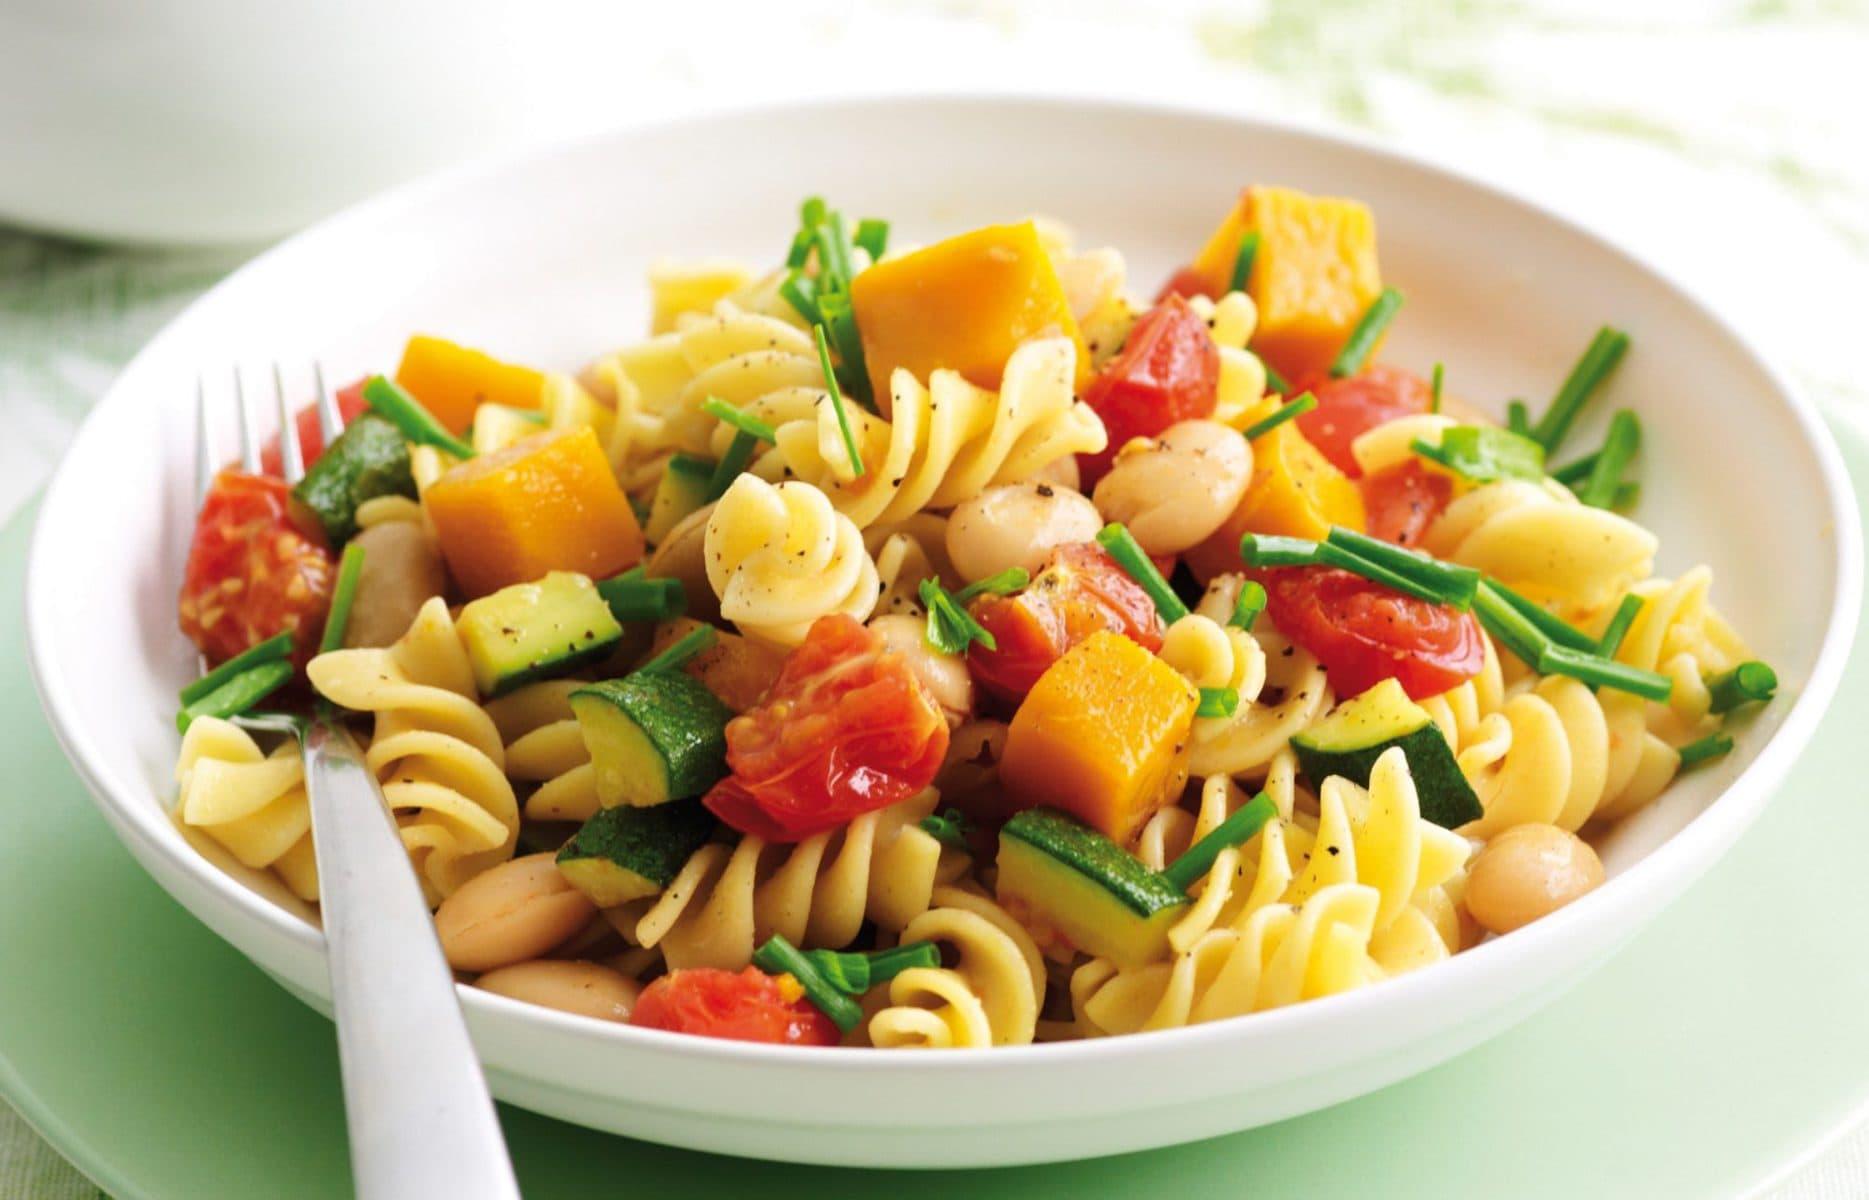 Healthy Food Programmes On Tv